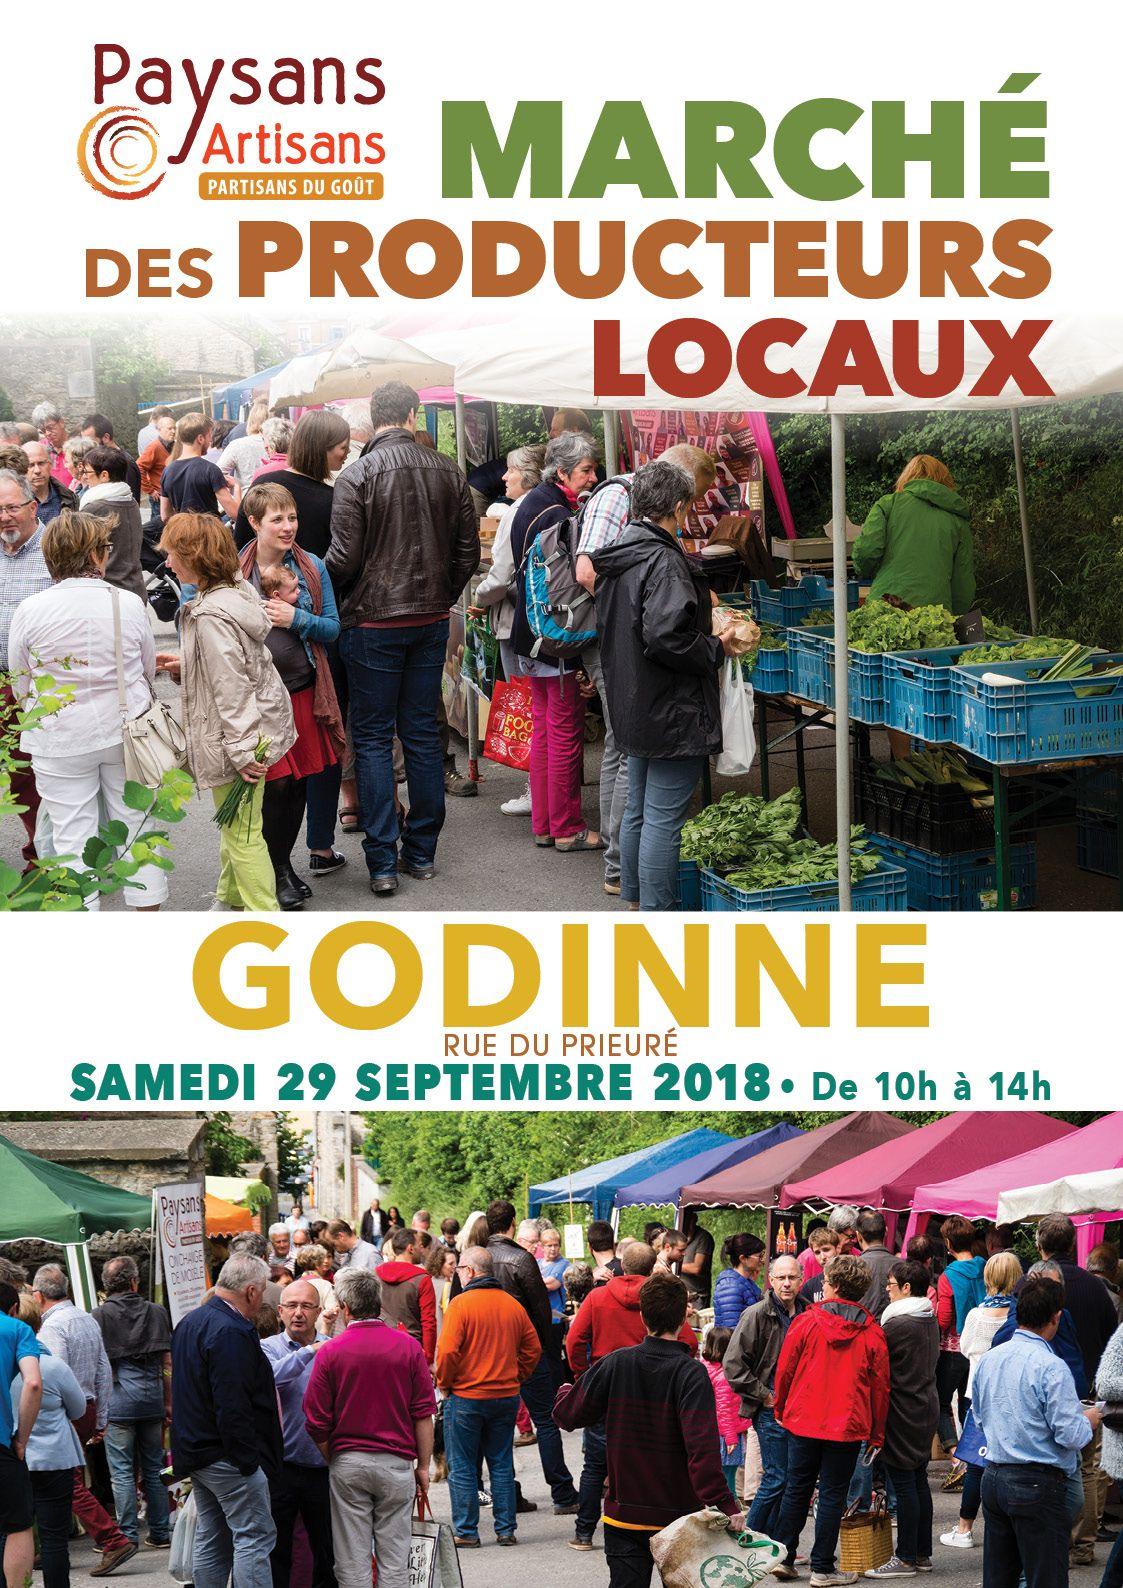 Marché Paysans-Artisans à Godinne !